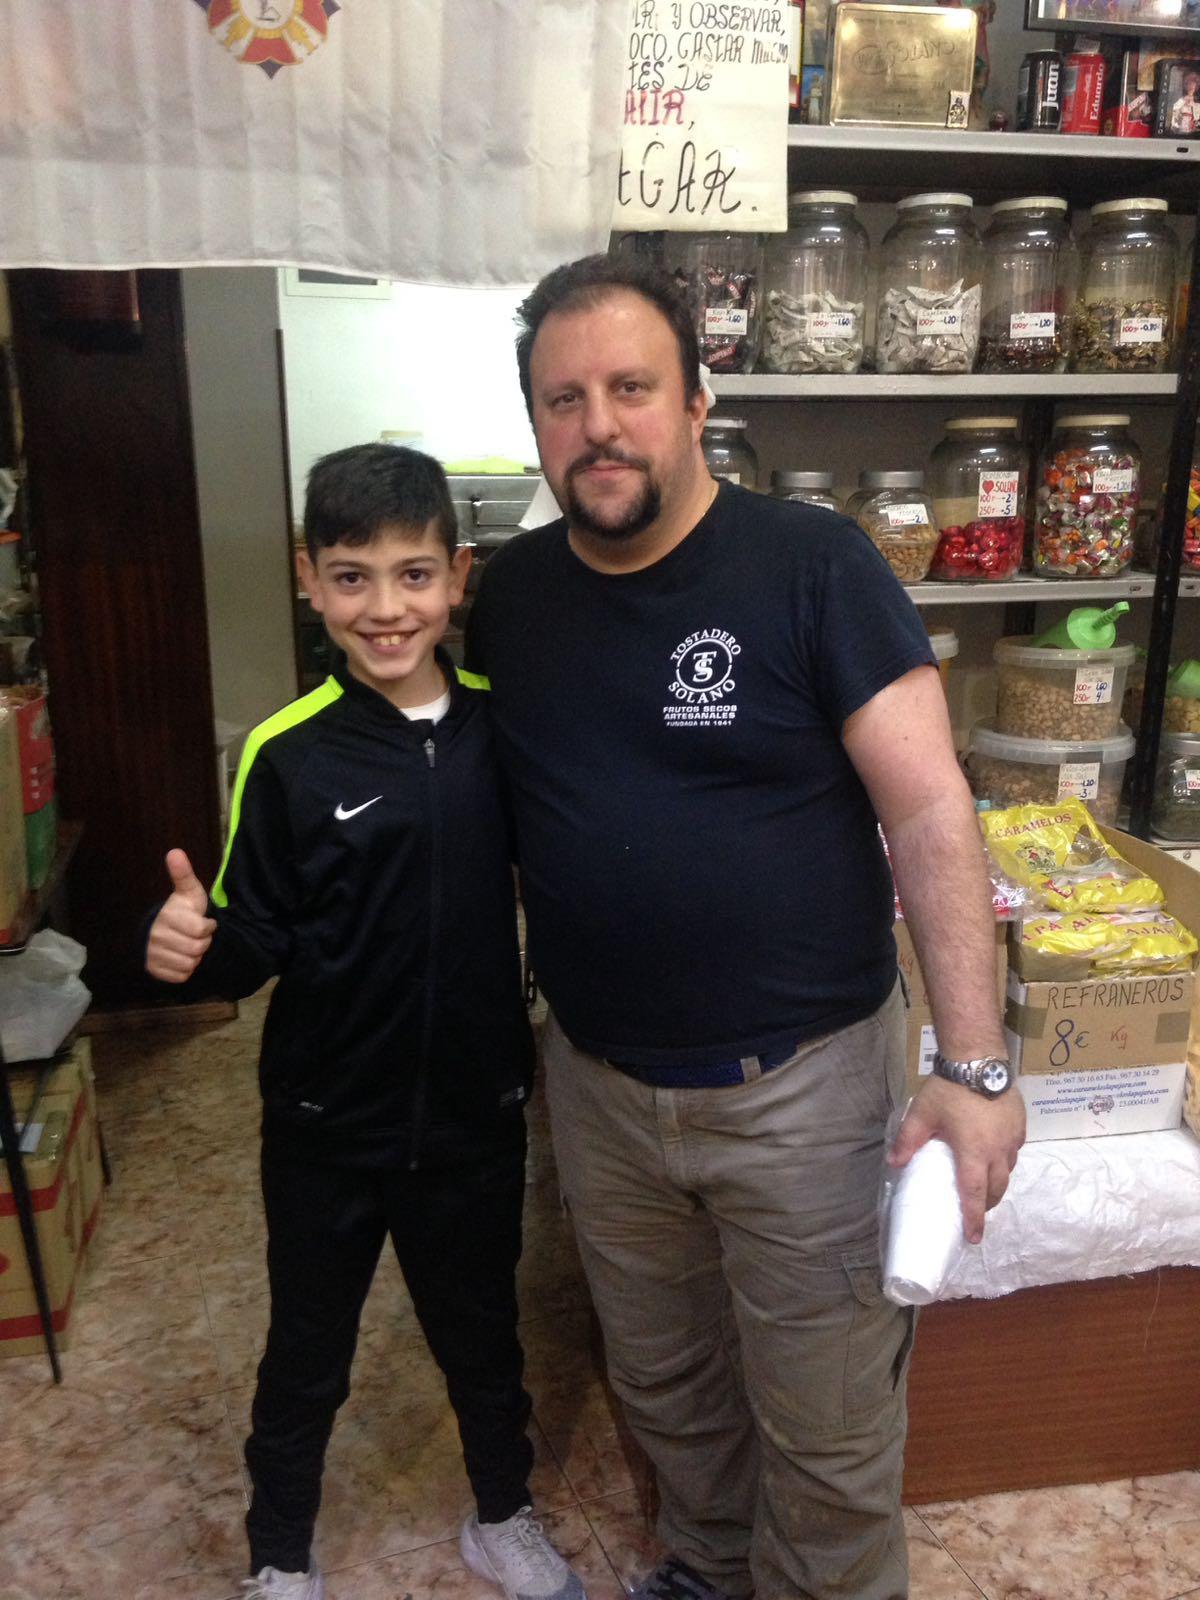 Eduardo Solano, junto con Dani Avila, futura promesa del Barça